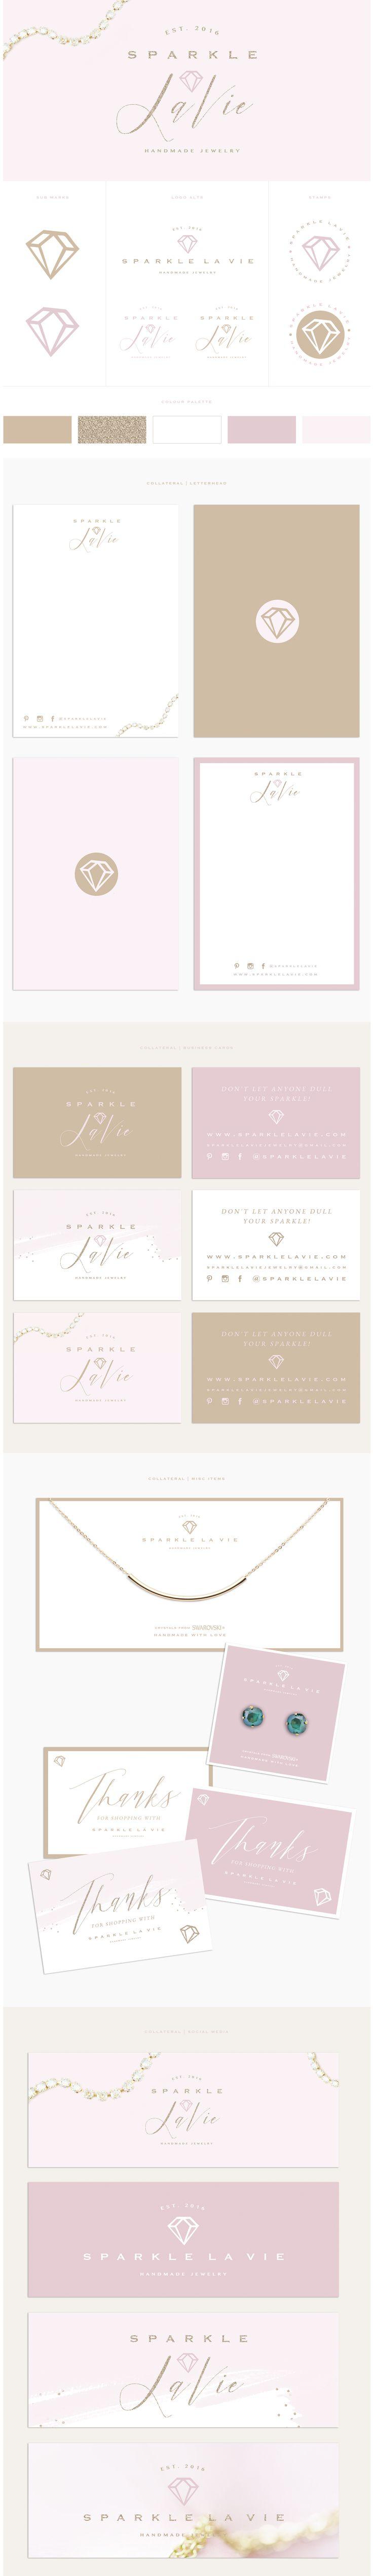 Brand Design for Sparkle La Vie by Brand Me Beautiful